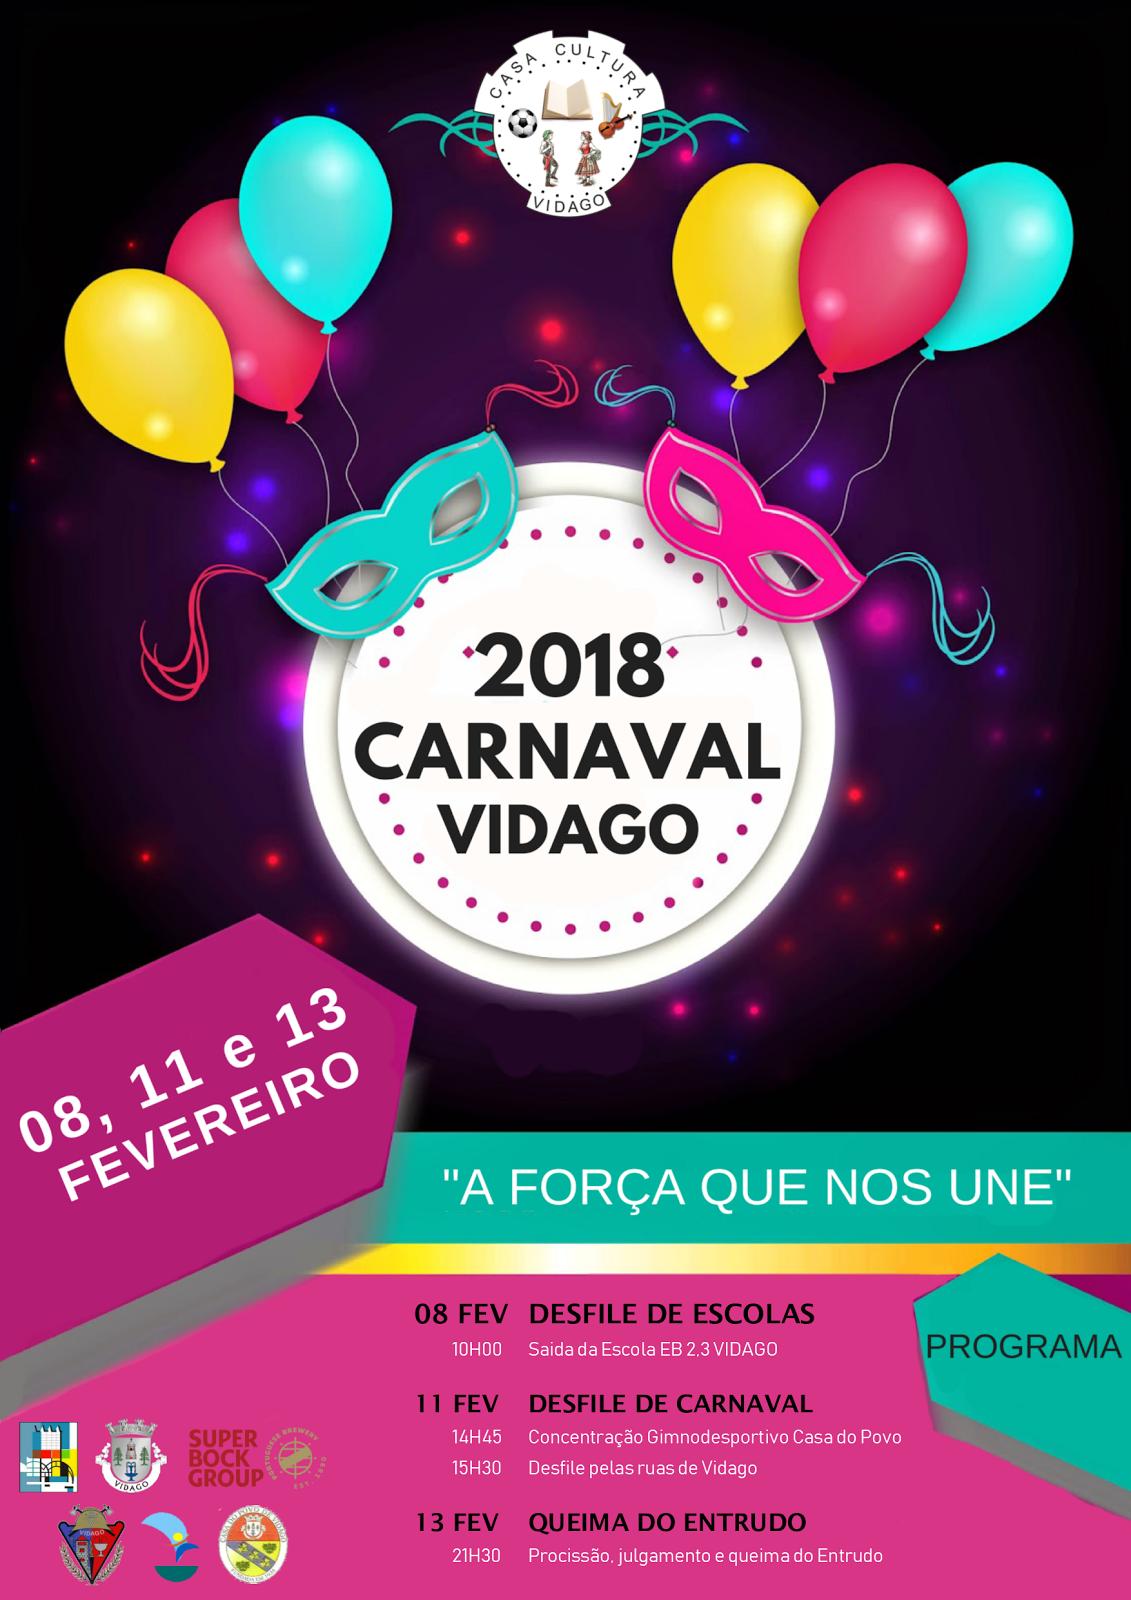 CARNAVAL VIDAGO 2018